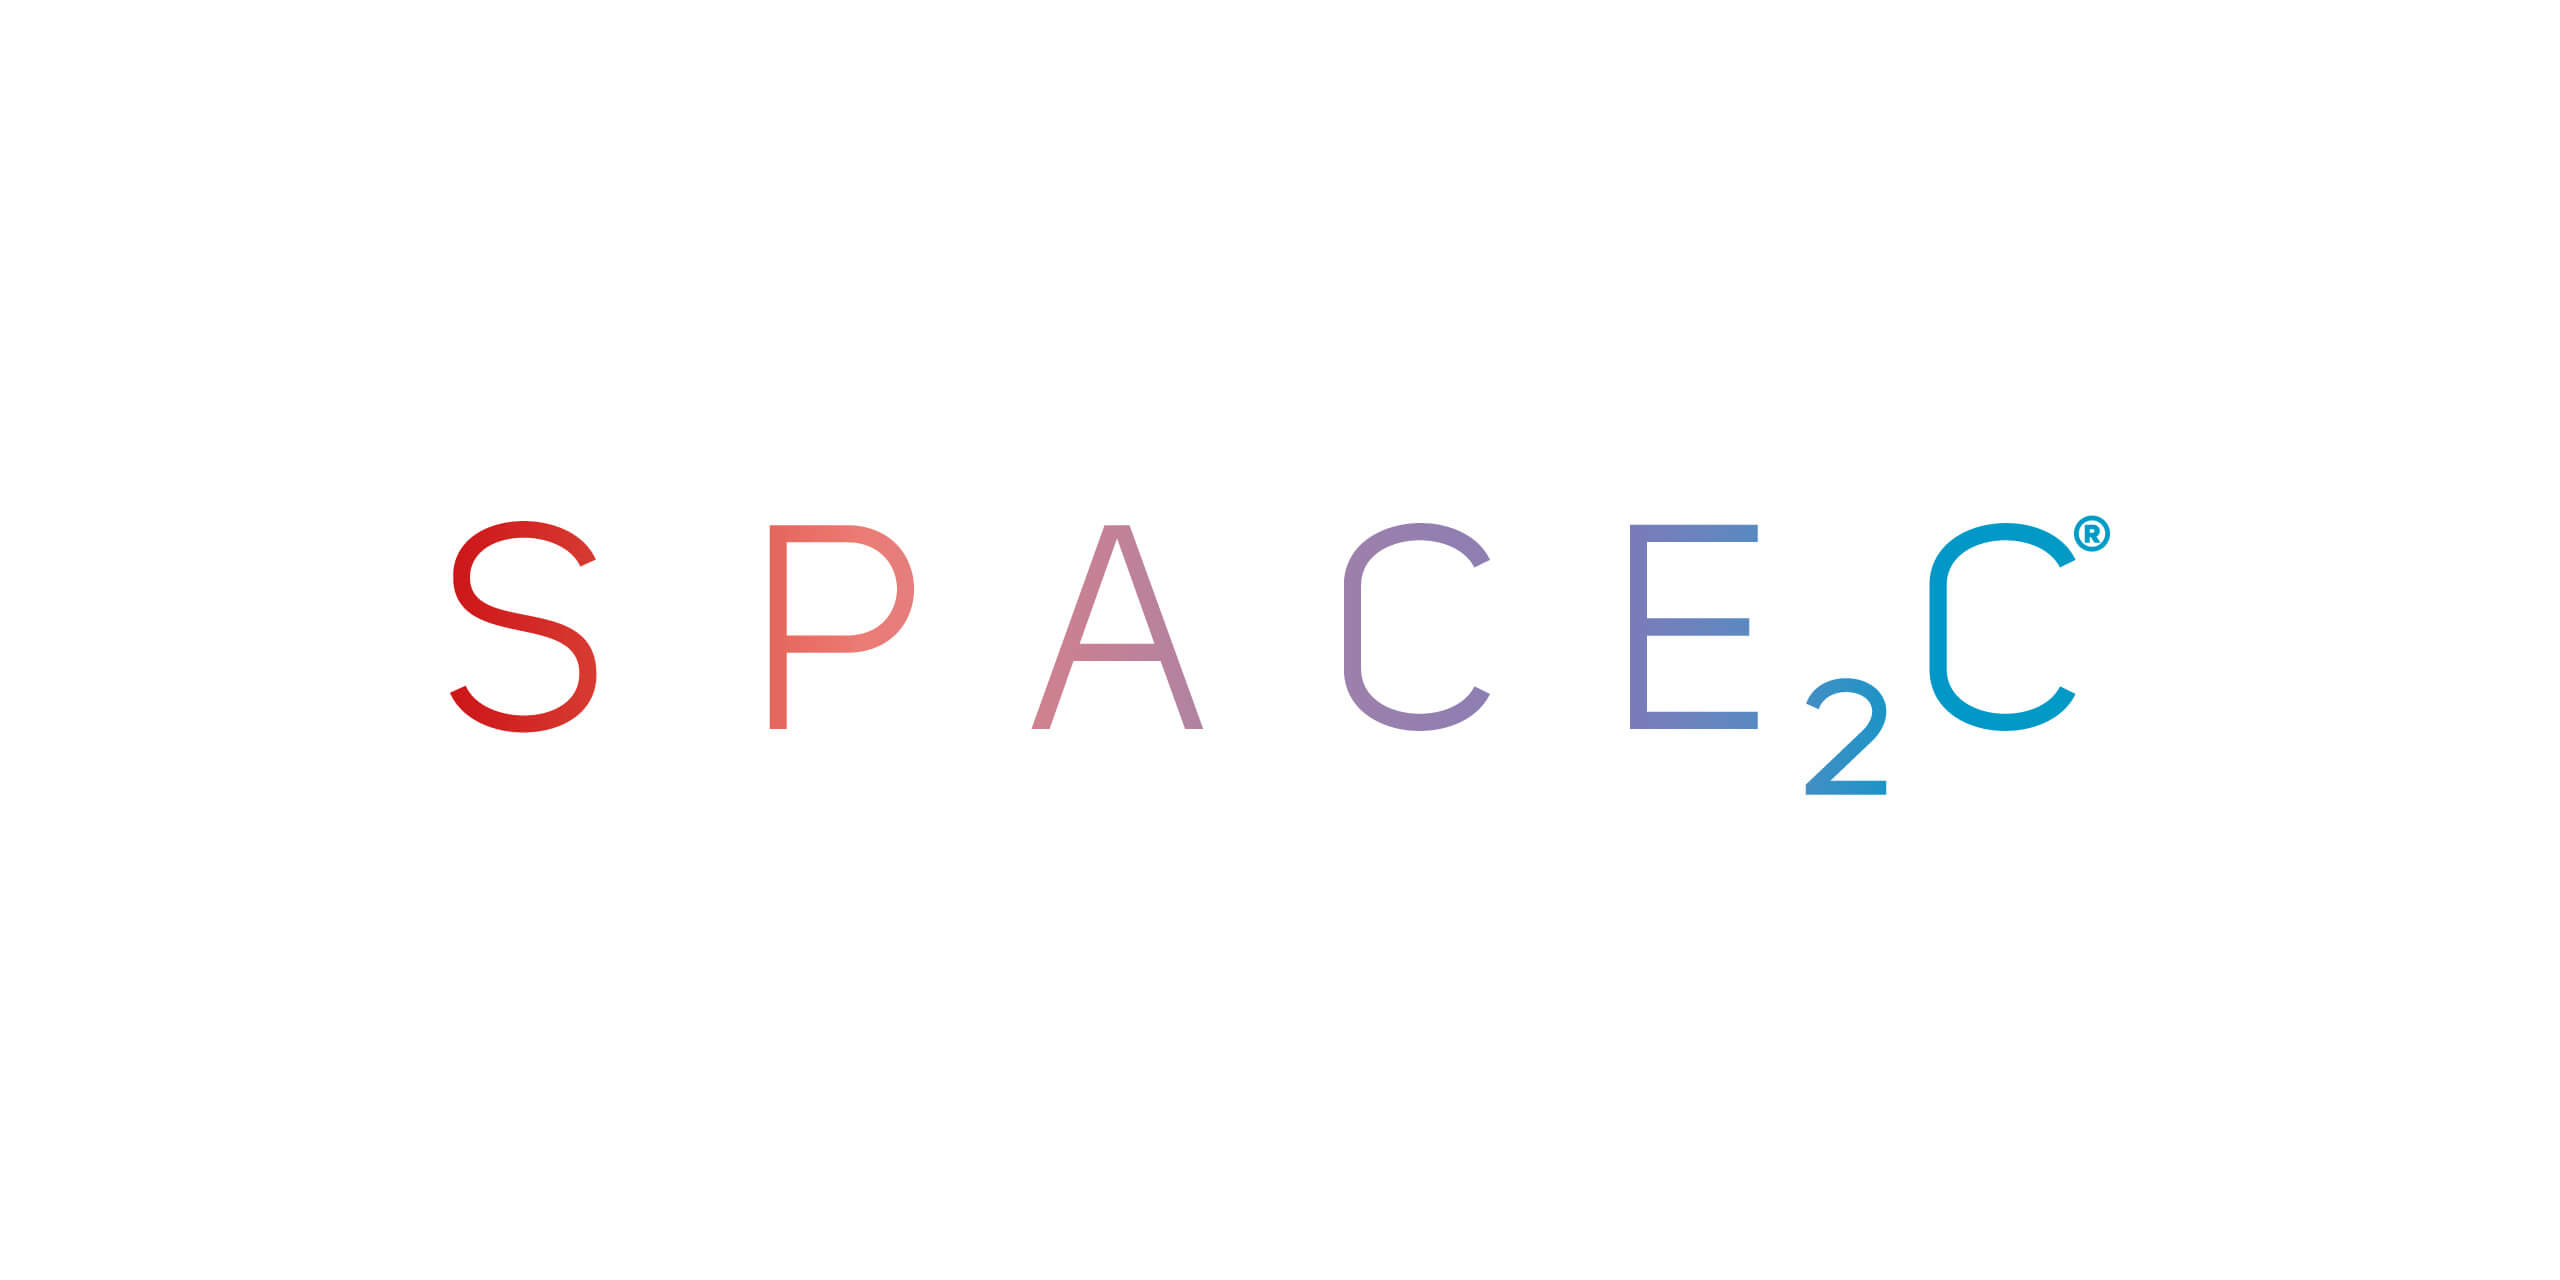 Space2C branding